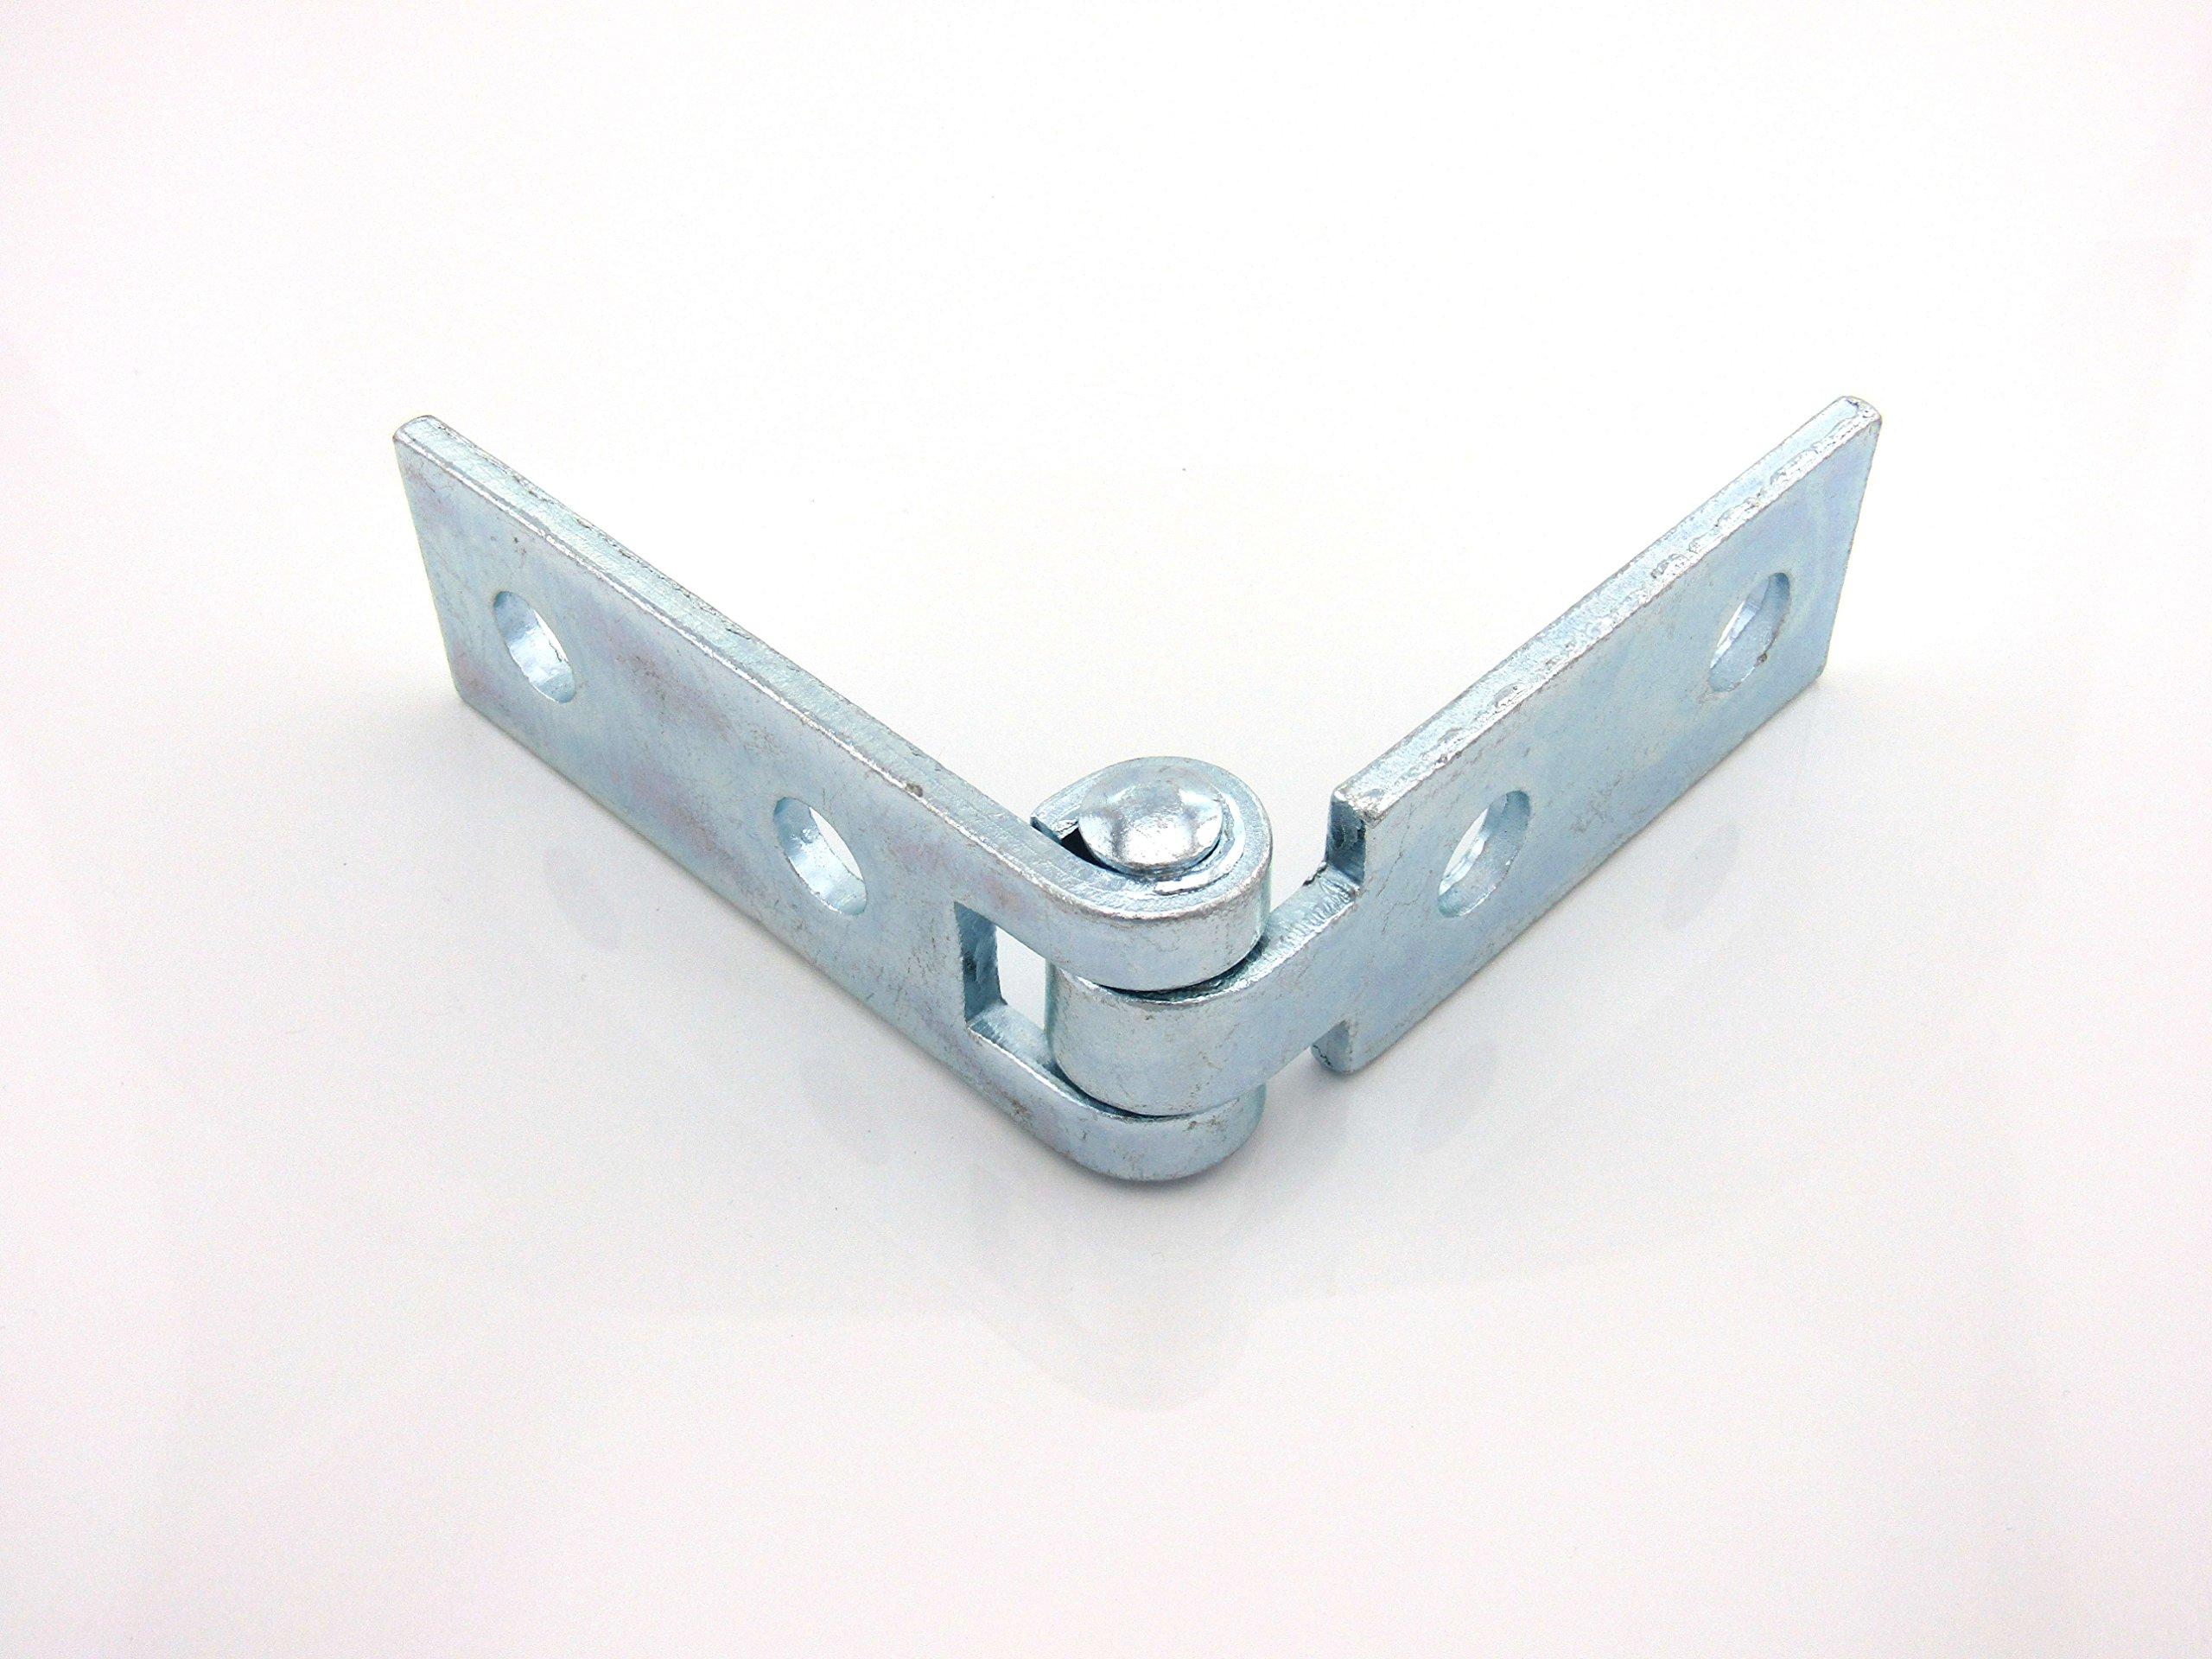 4-Hole Adjustable Hinge; E.G. Side, 1/2 X 3/4 Stud Other Side Plain (25 per box)